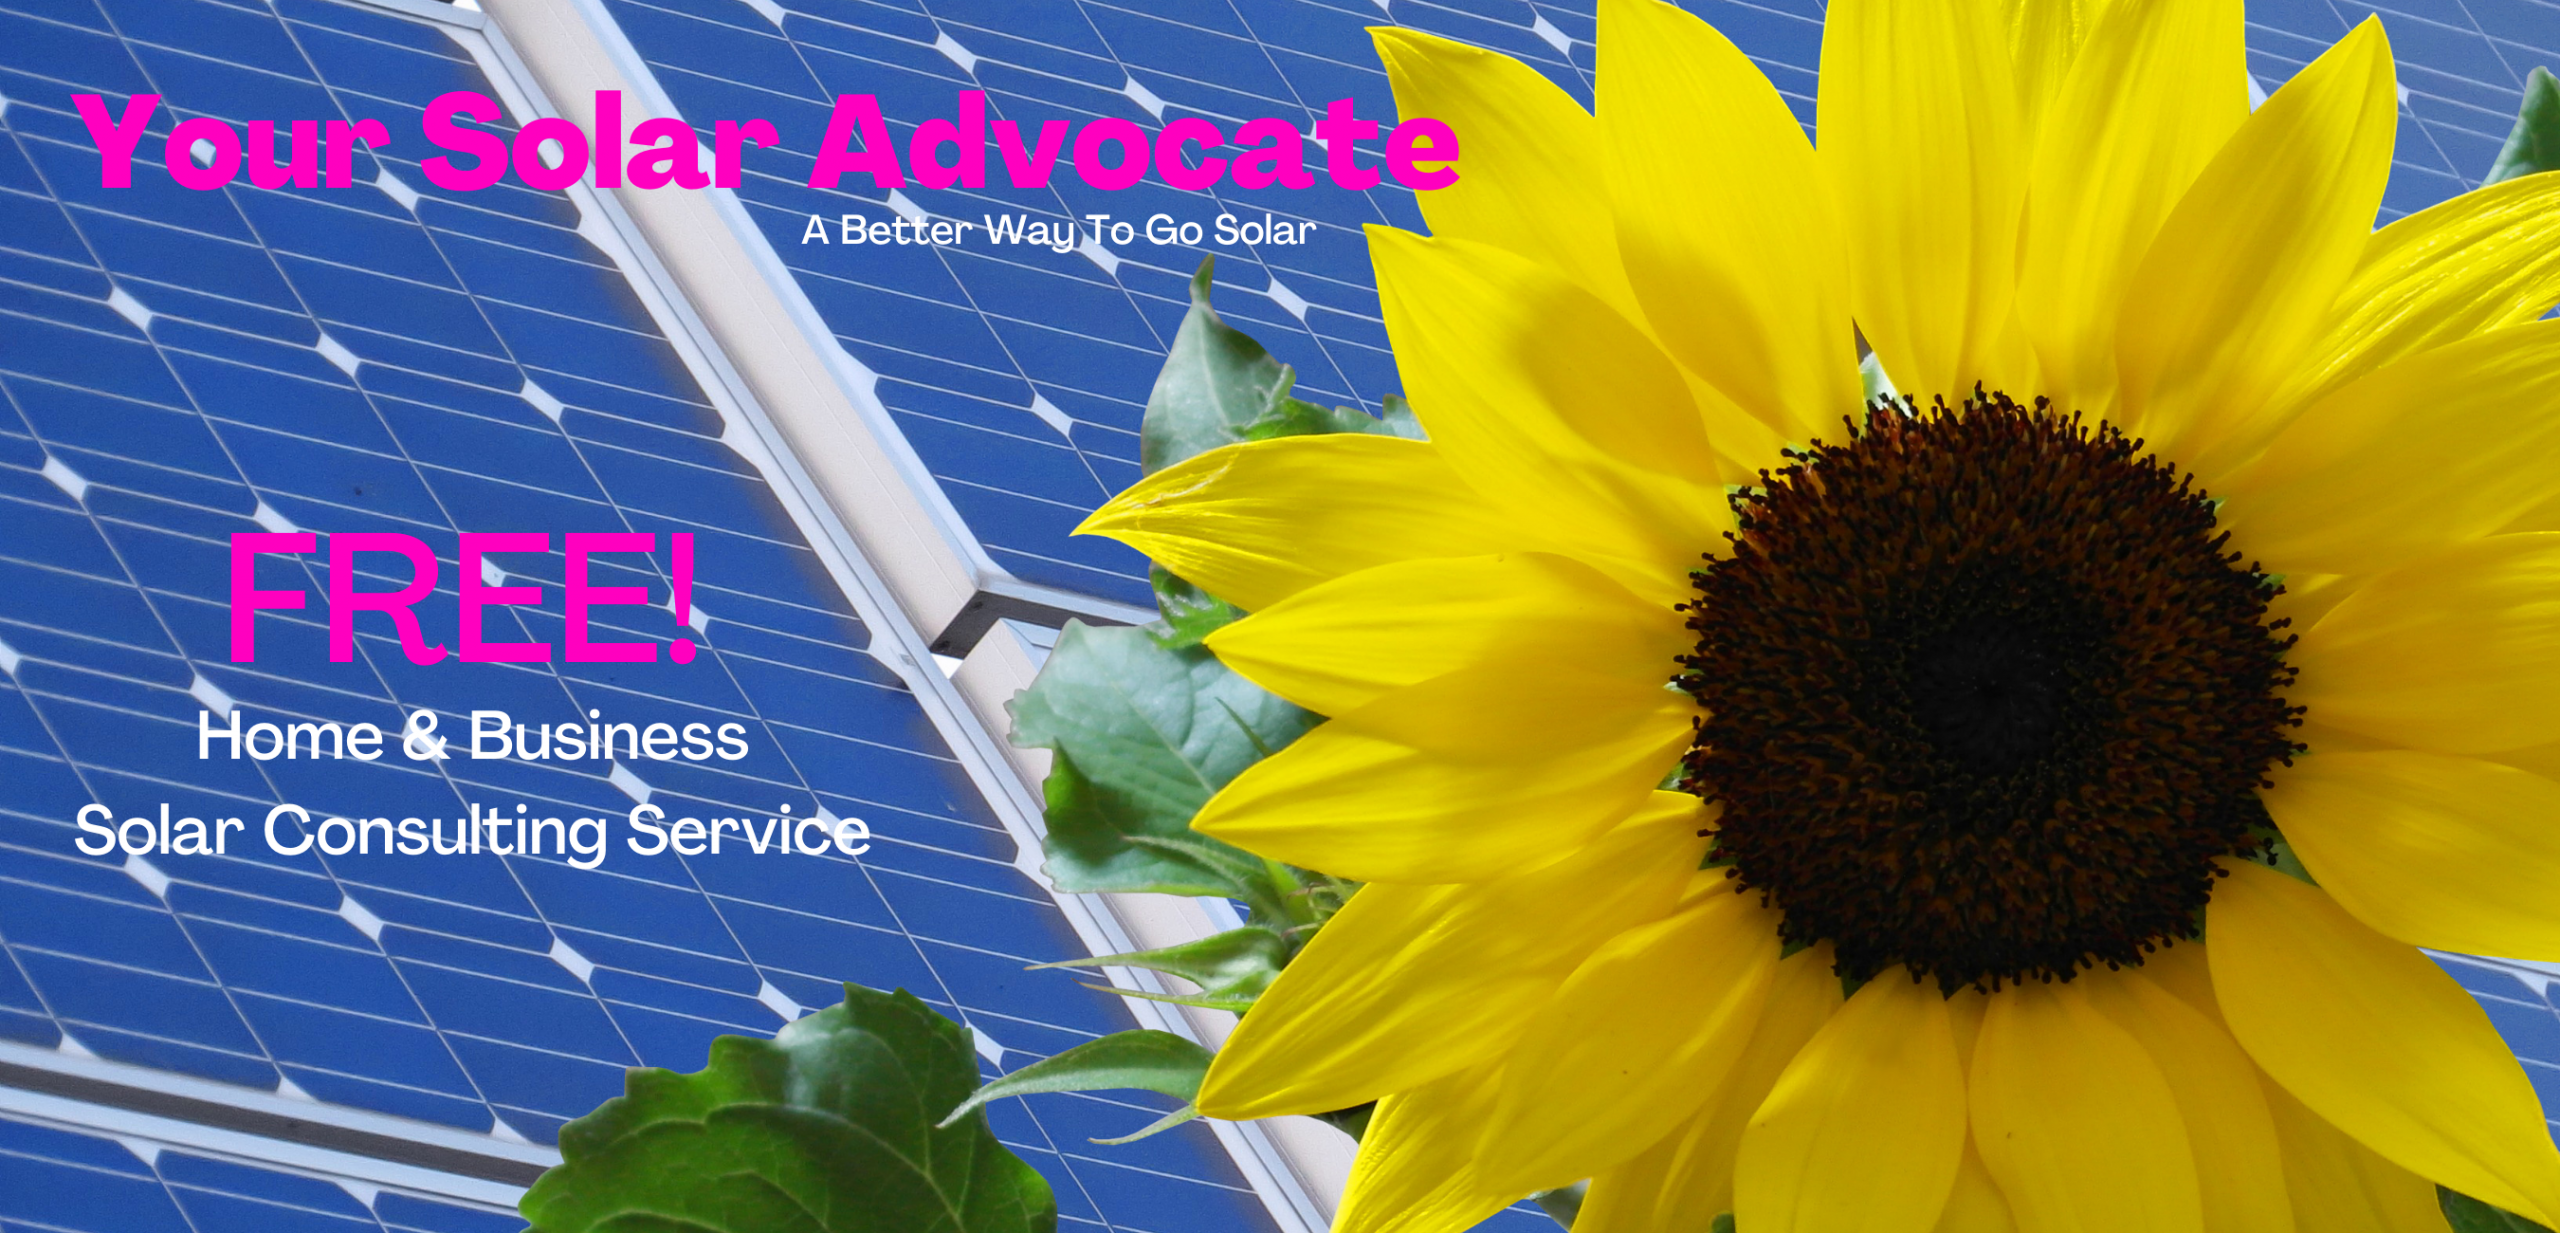 Your Solar Advocate